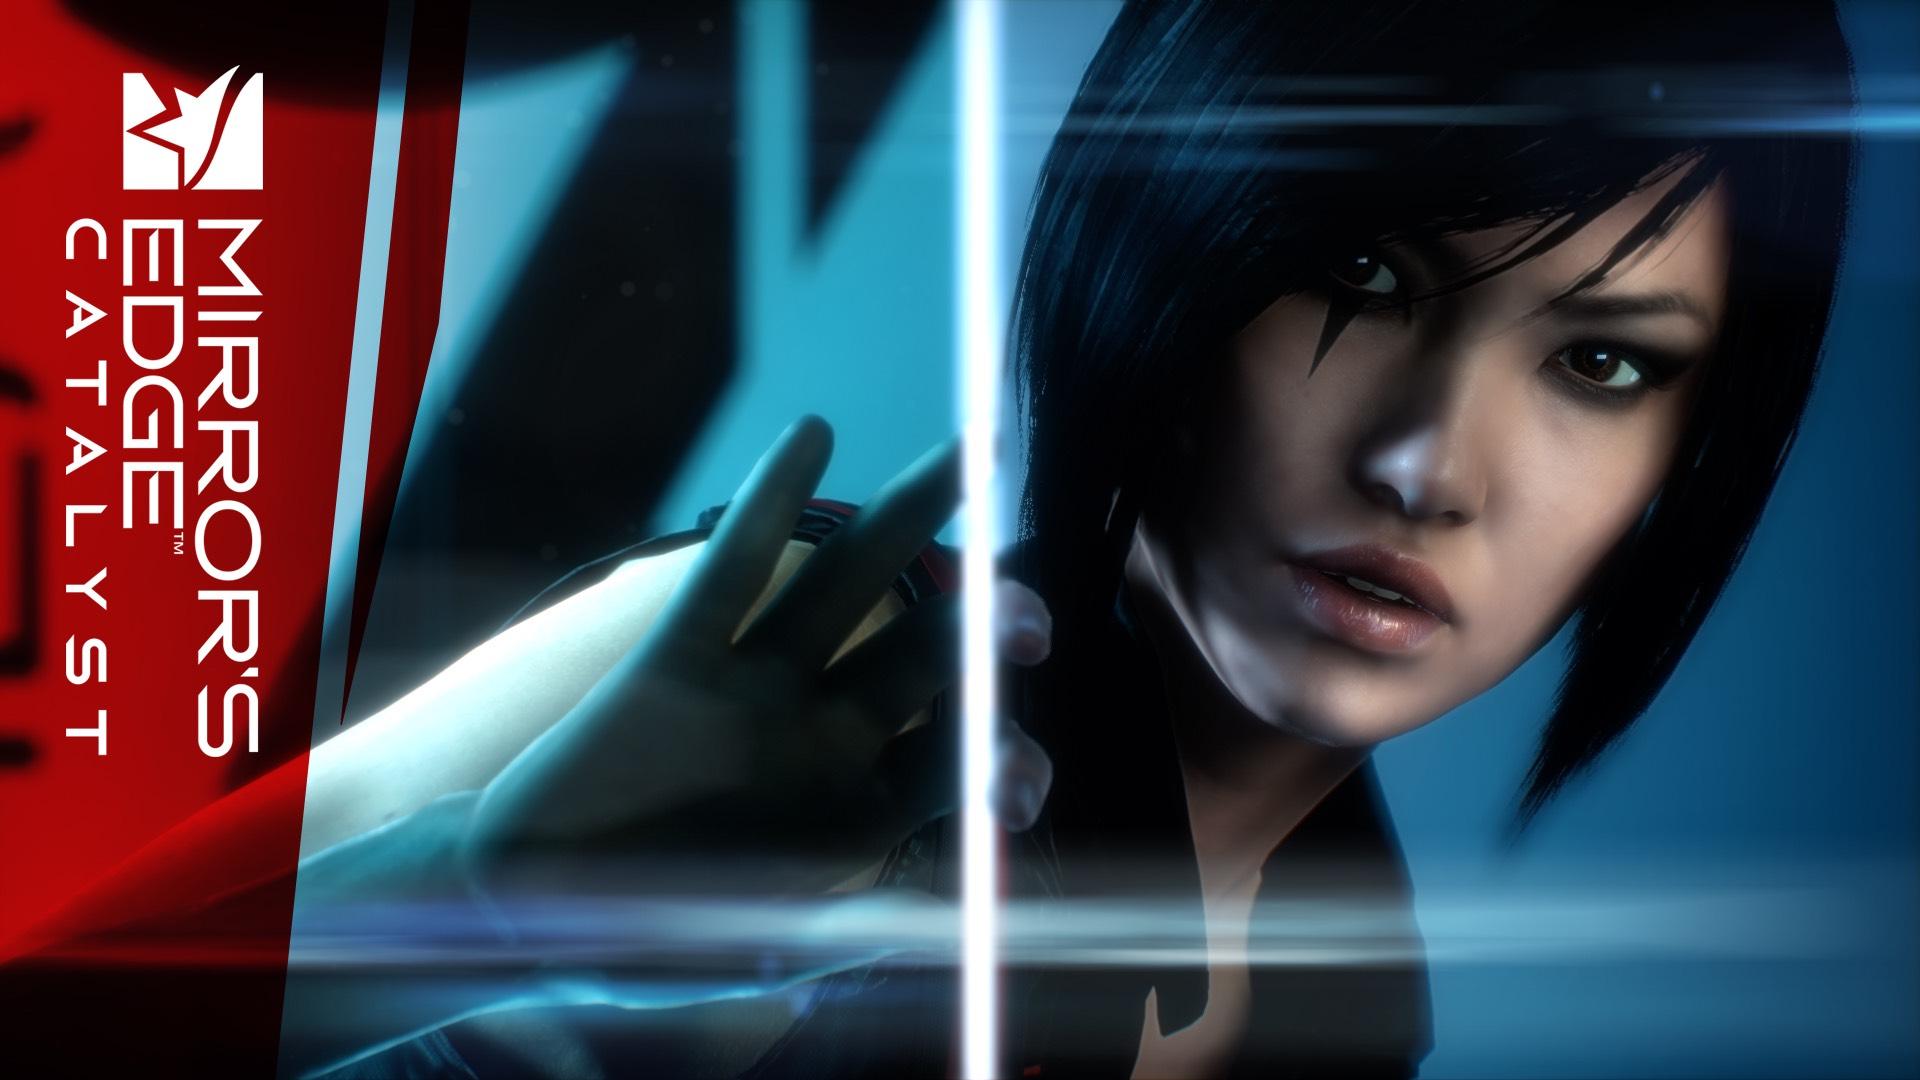 Mirror's Edge Catalyst Gameplay Trailer - Mirror's Edge ...